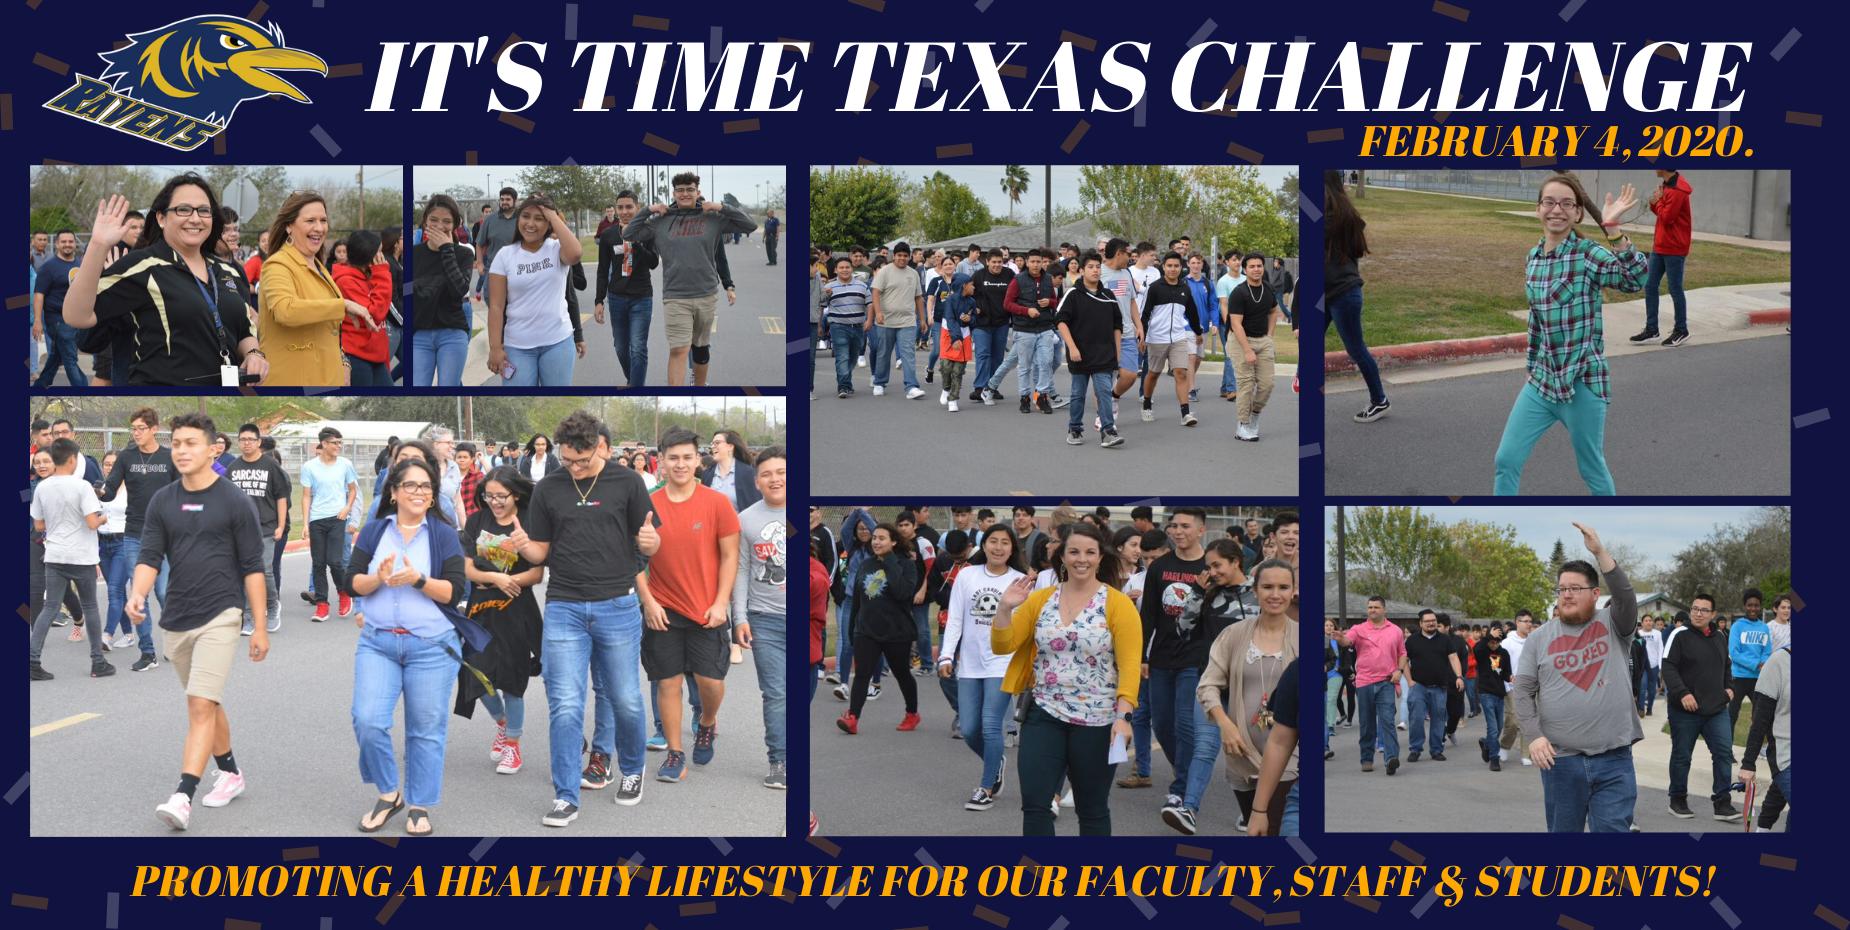 It's Time Texas Challenge